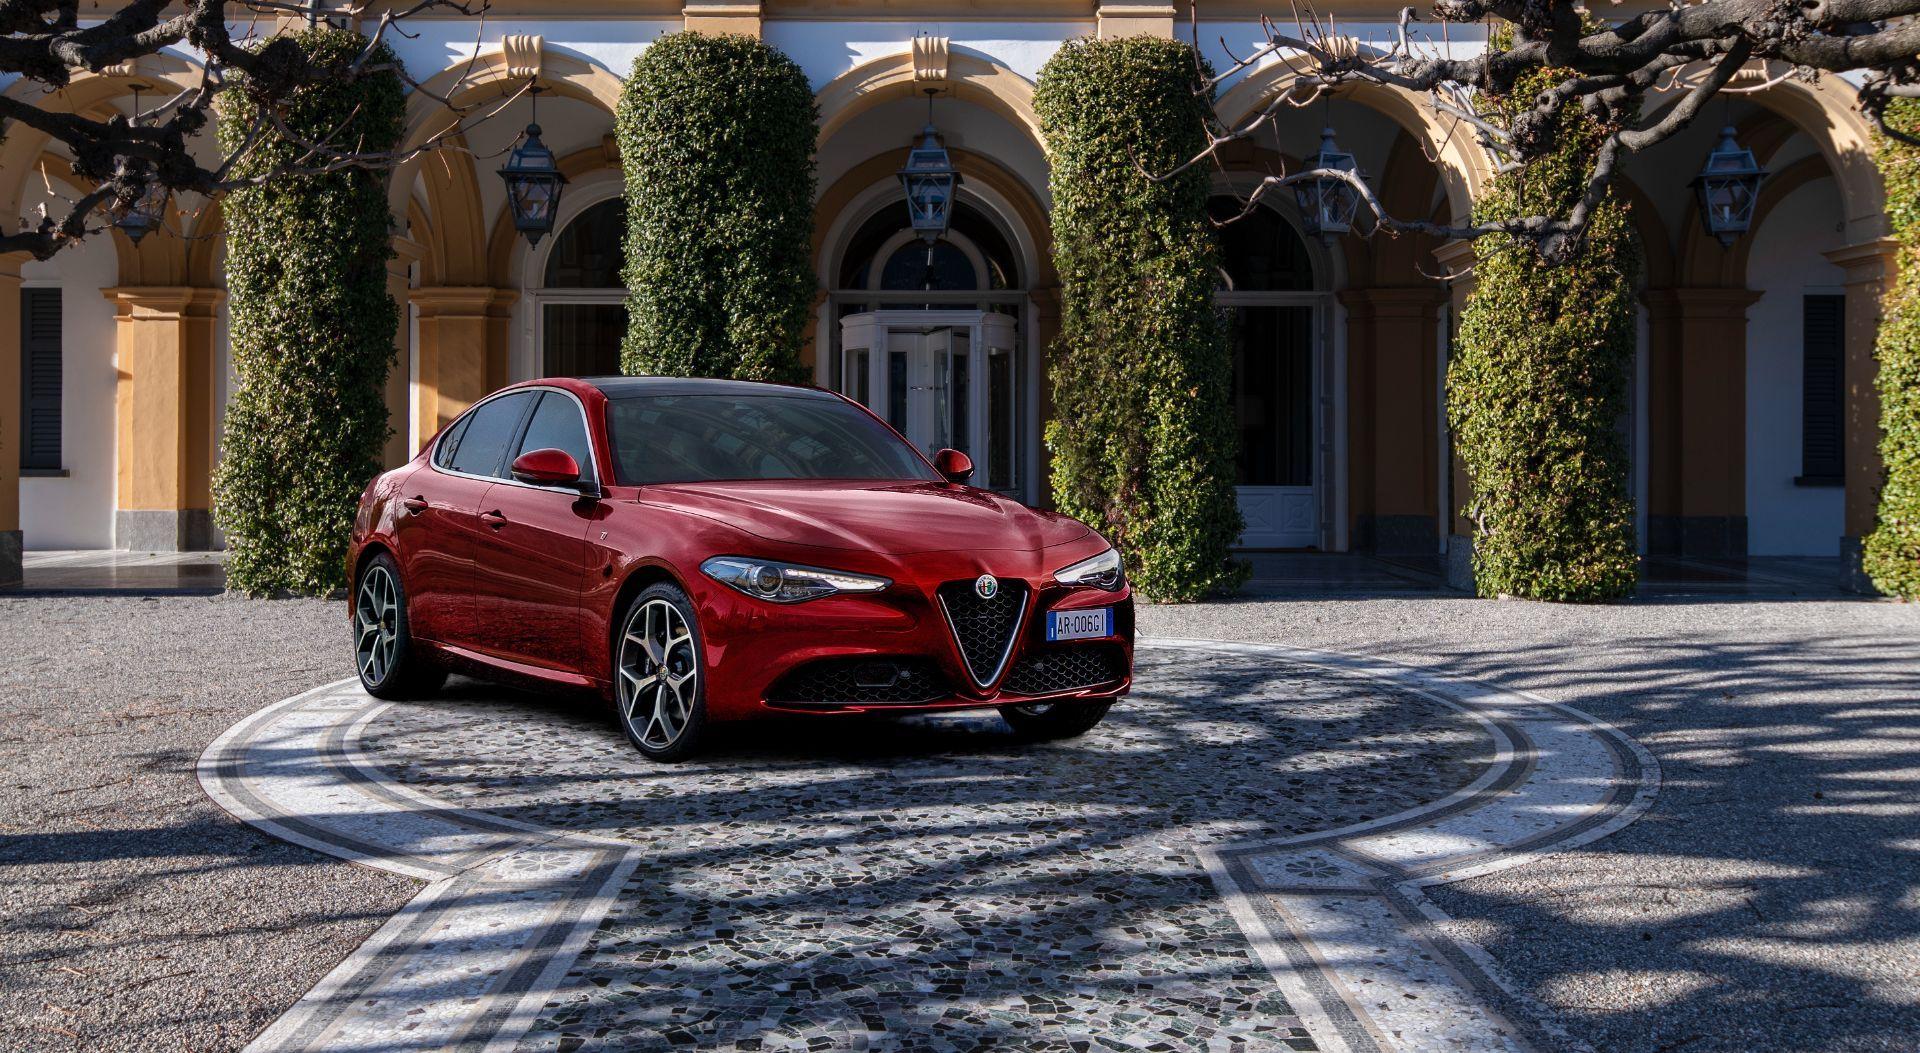 Alfa-Romeo-Giulia-and-Stelvio-6C-Villa-dEste-15